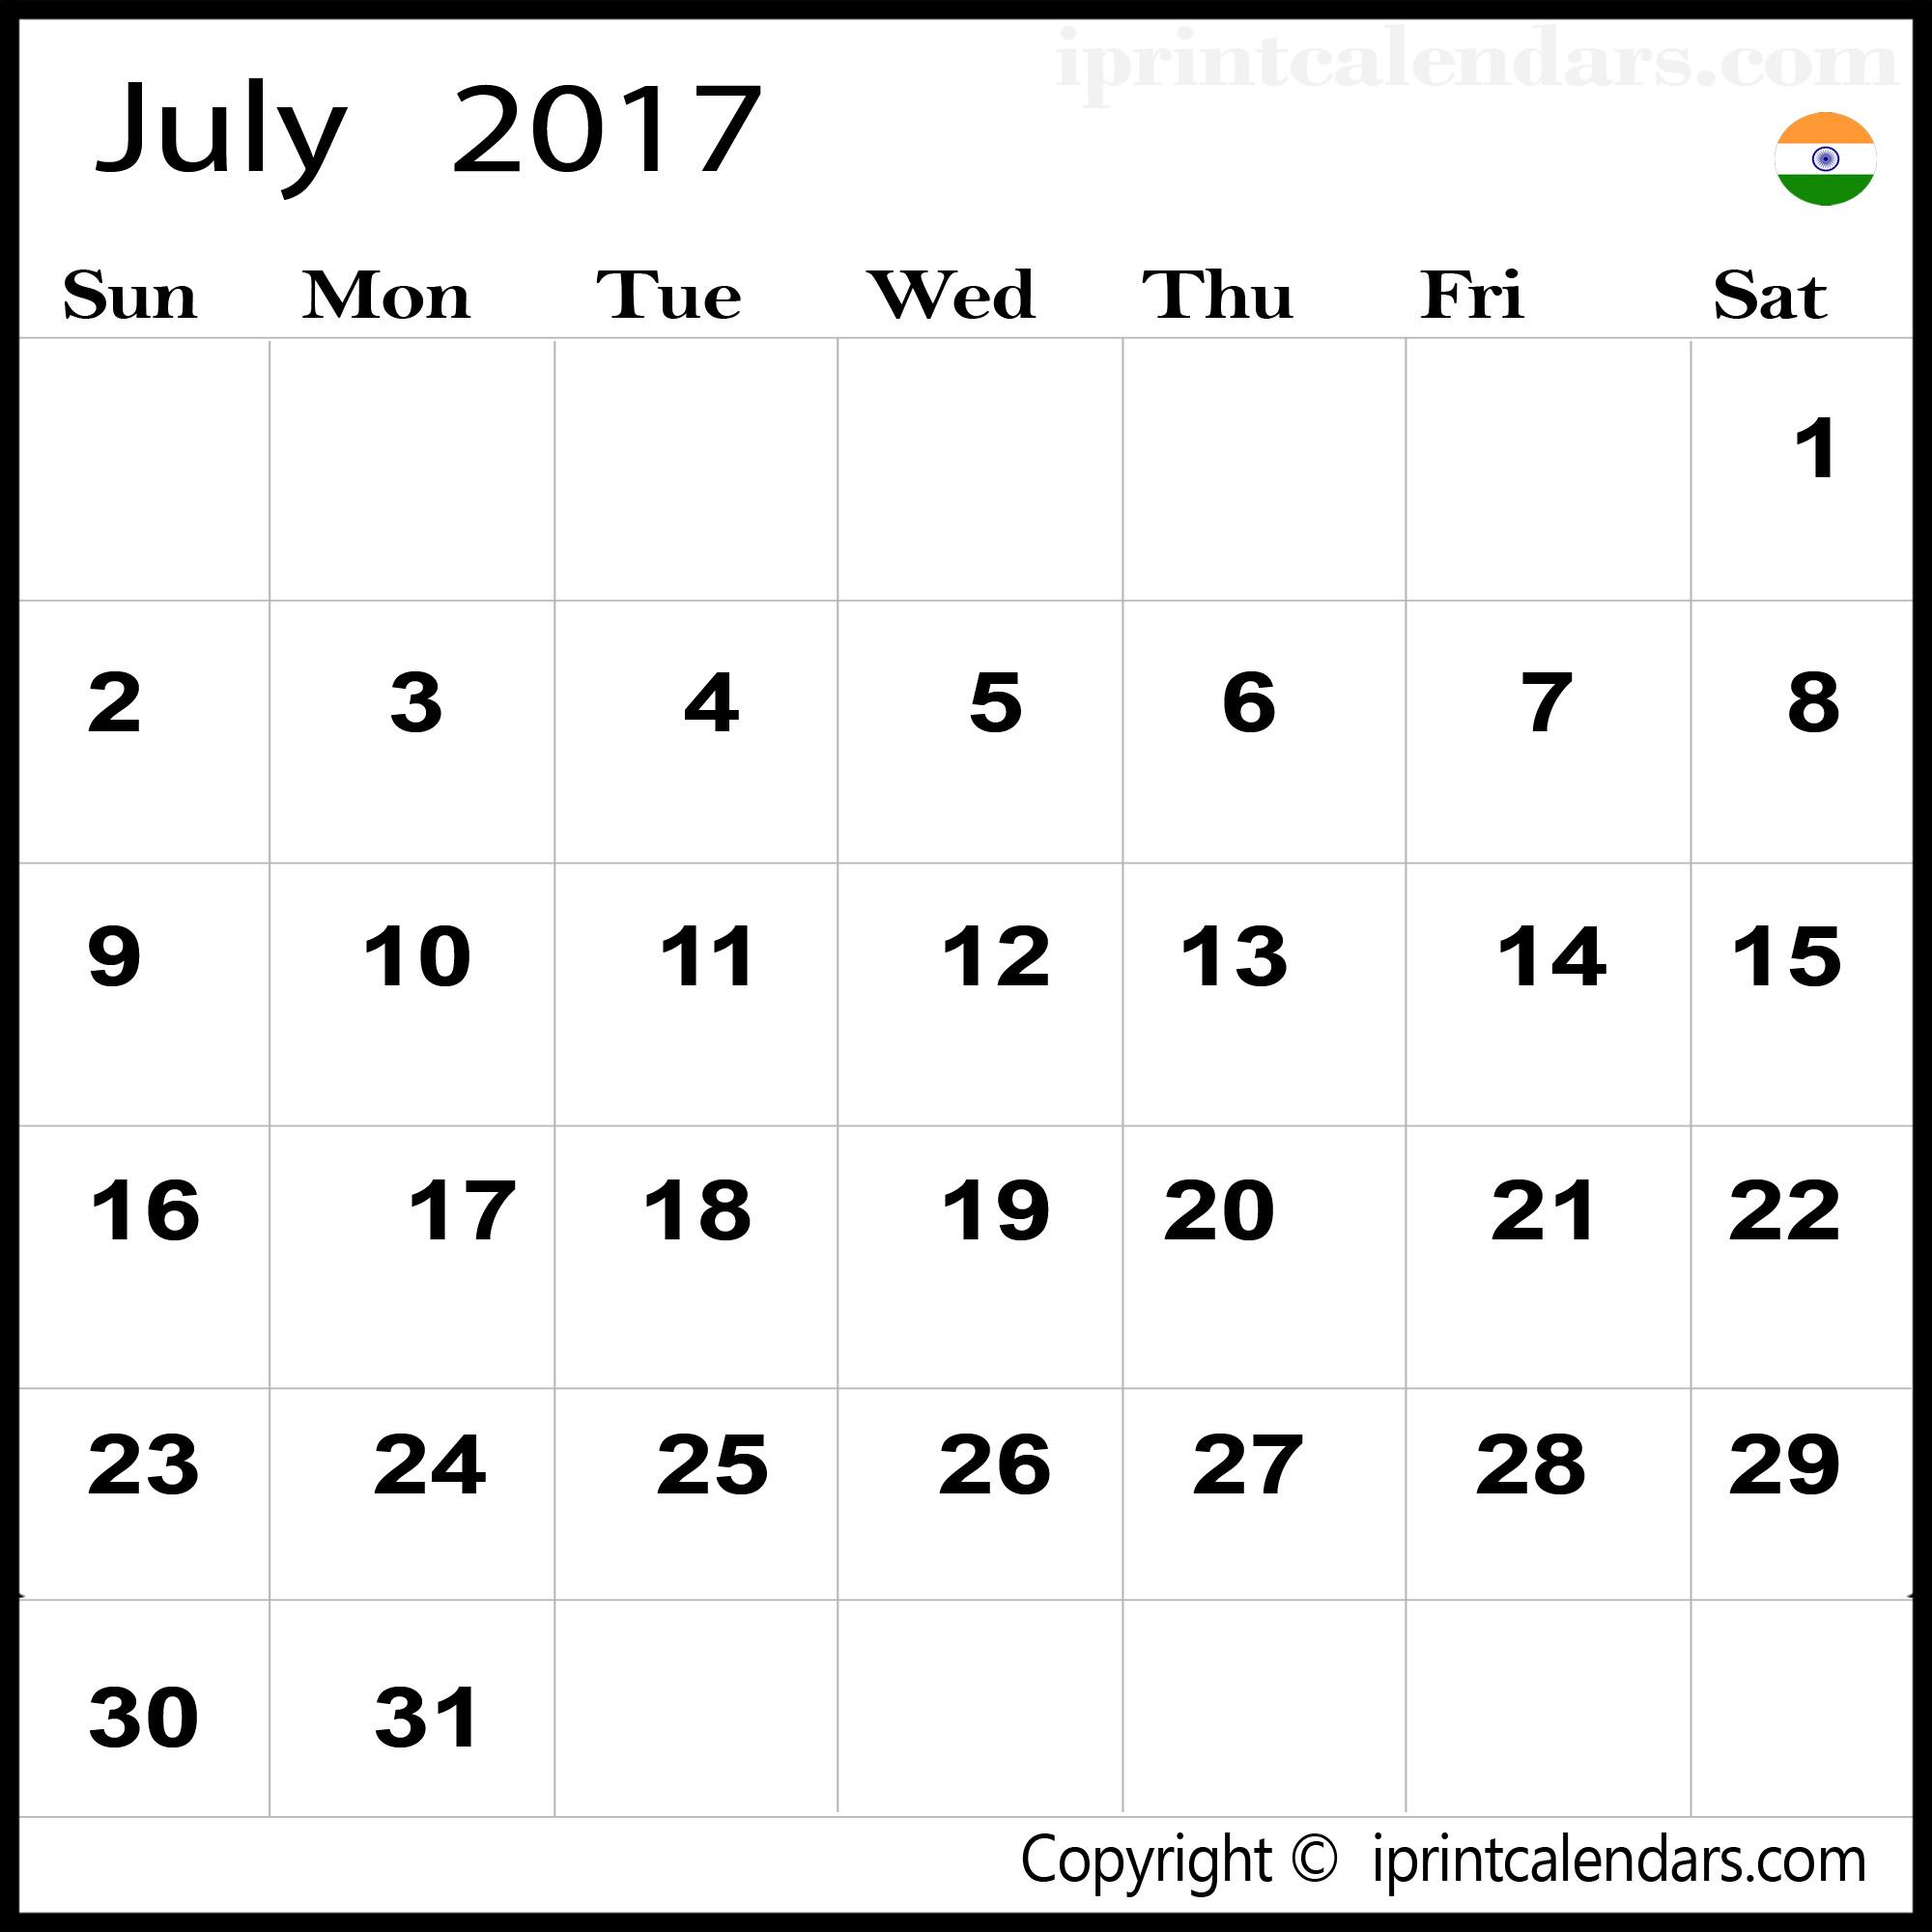 july 2017 calendar india